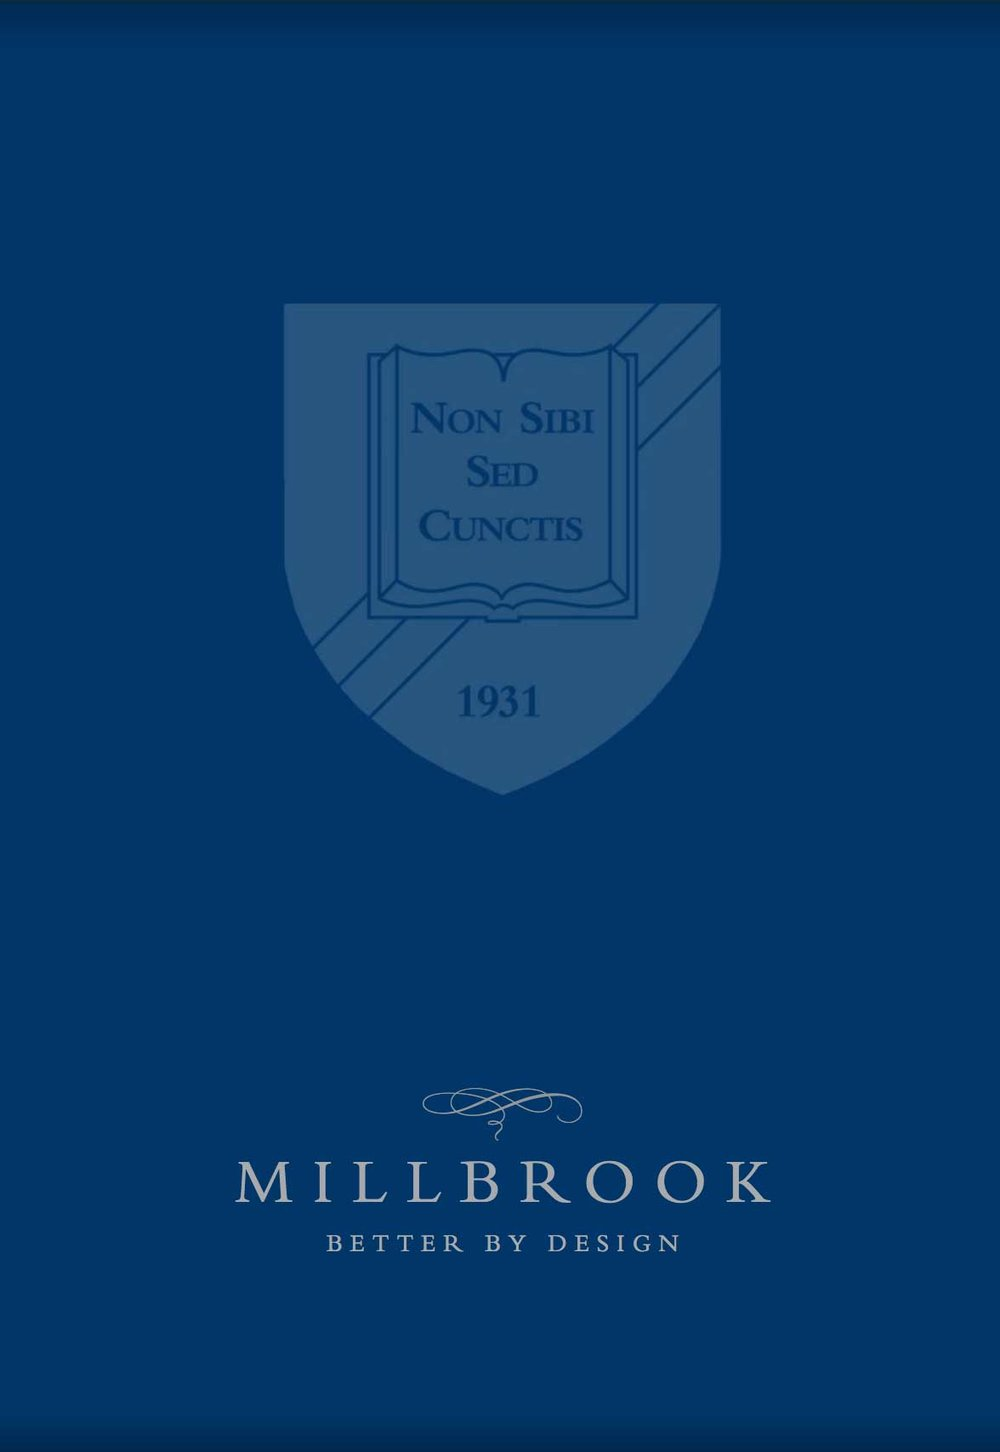 MillbrookCover.jpg